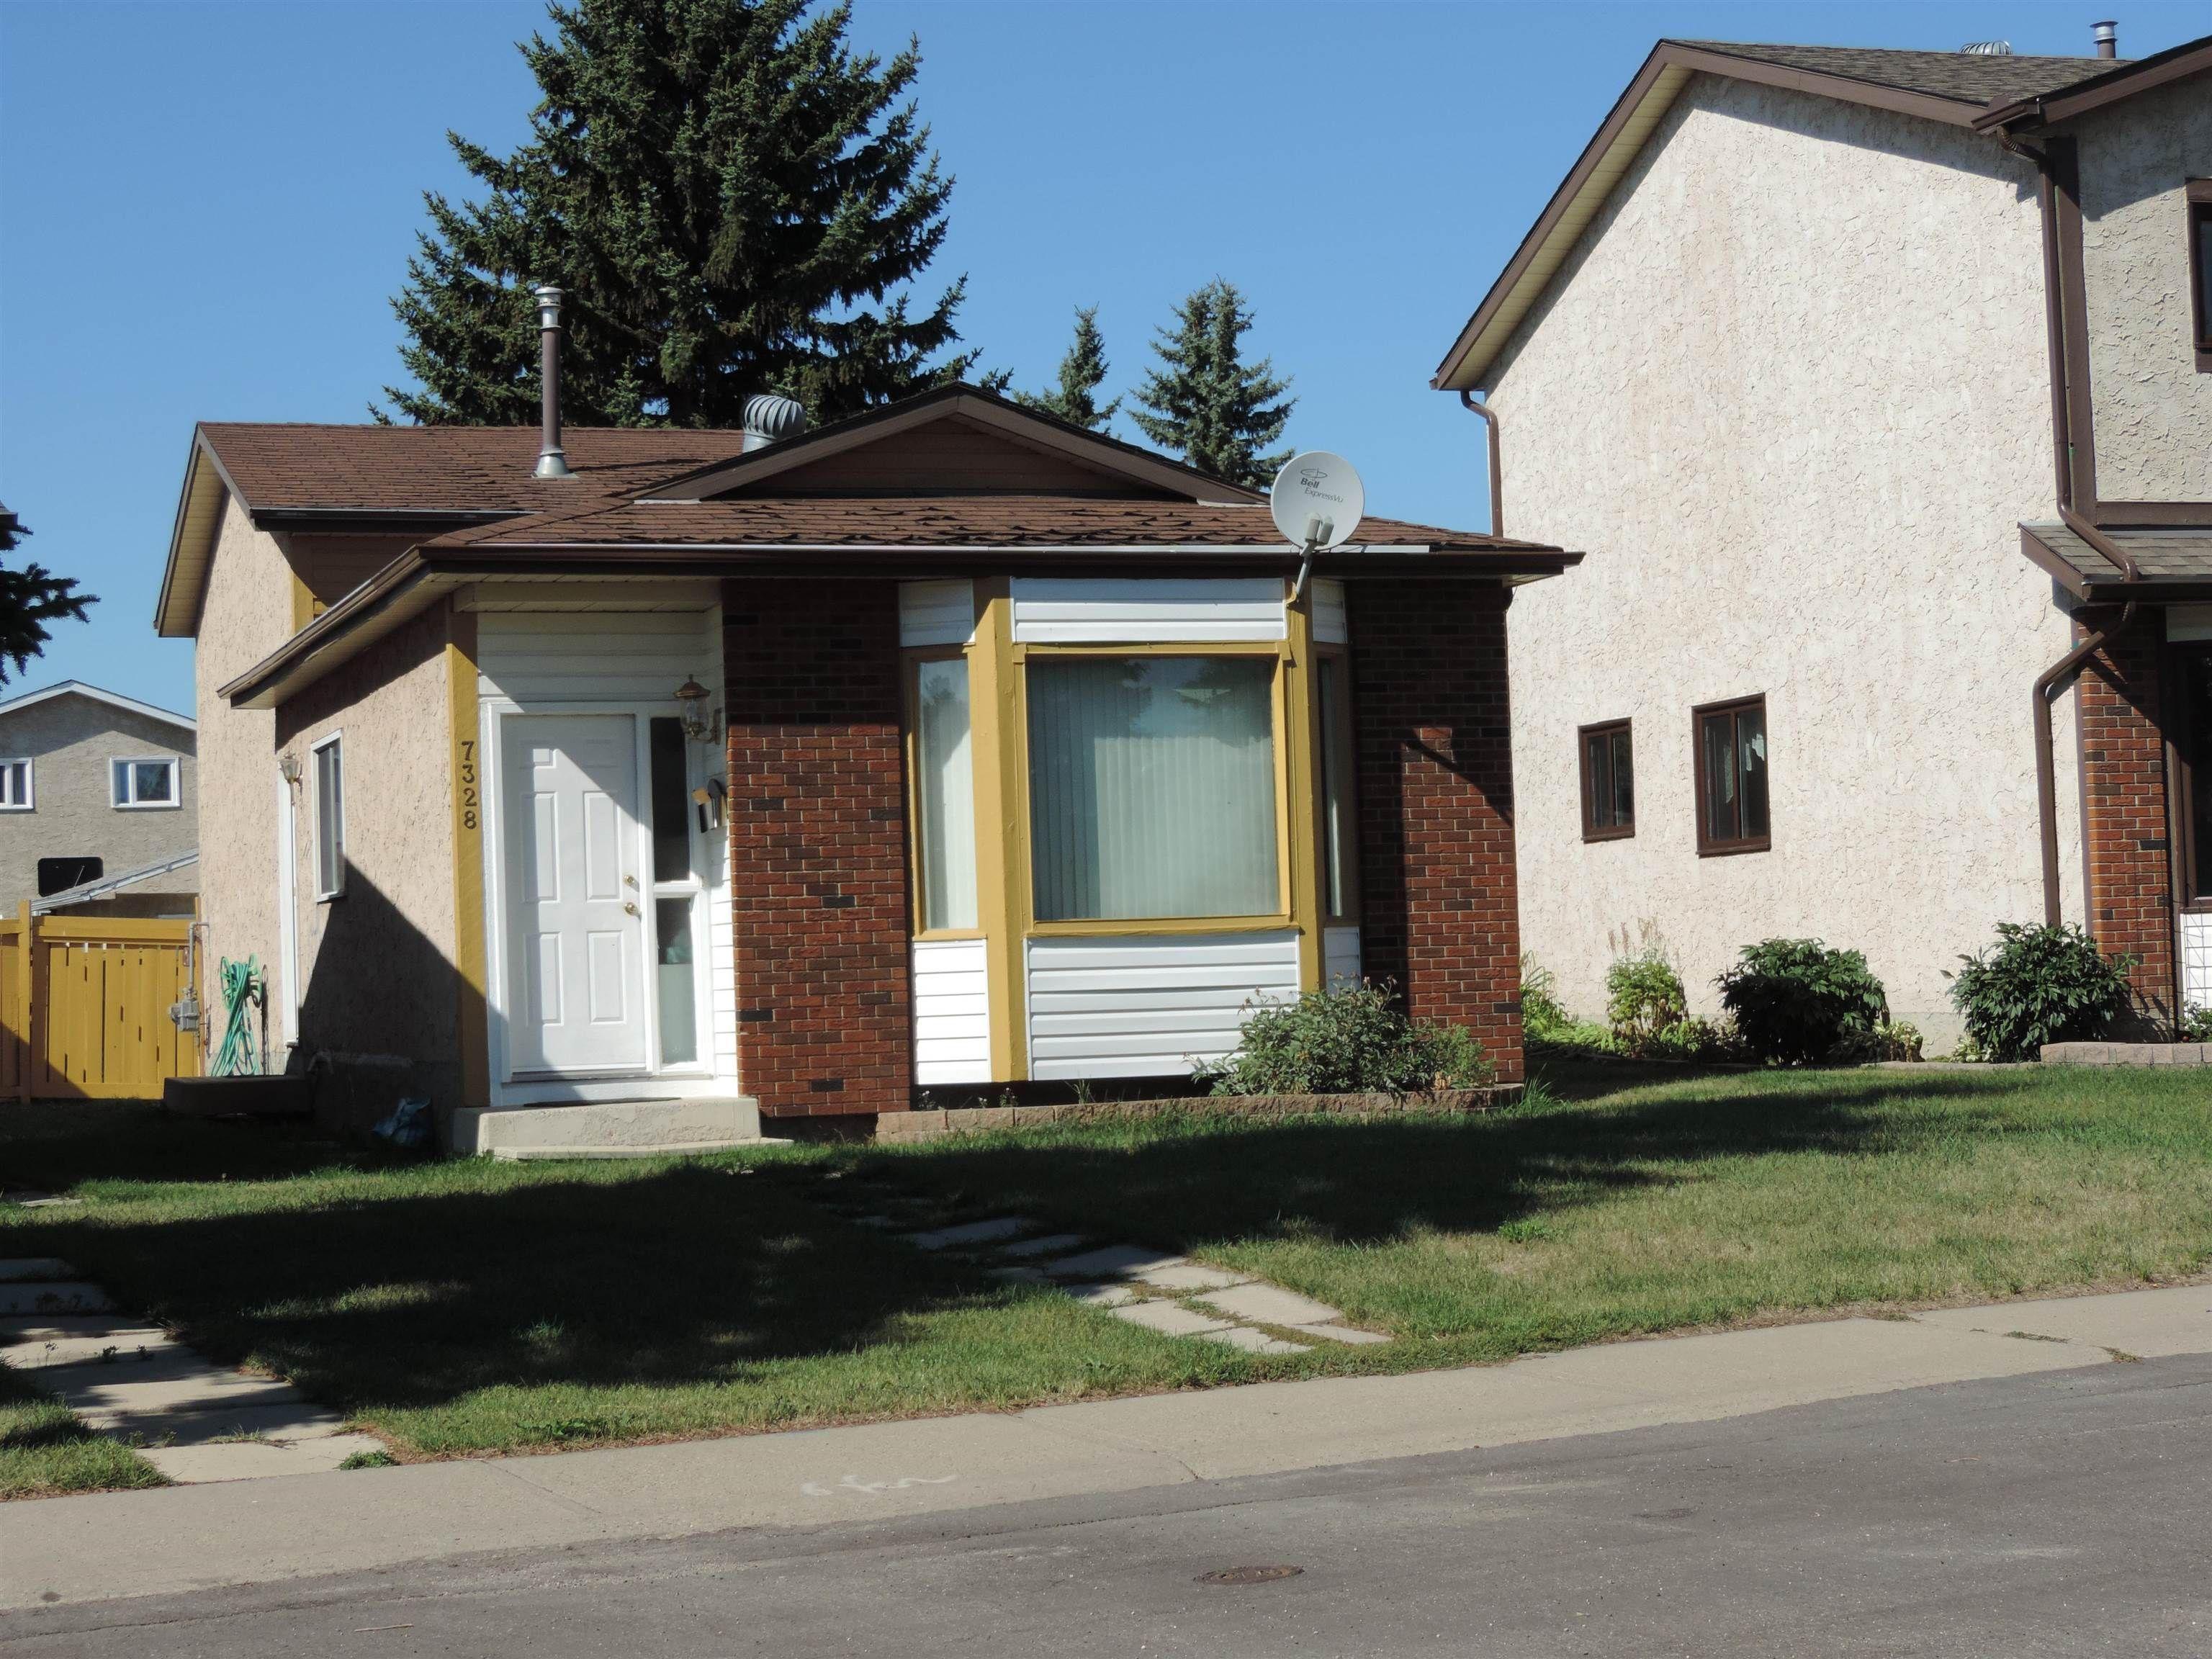 Main Photo: 7328 183B Street in Edmonton: Zone 20 House for sale : MLS®# E4261957